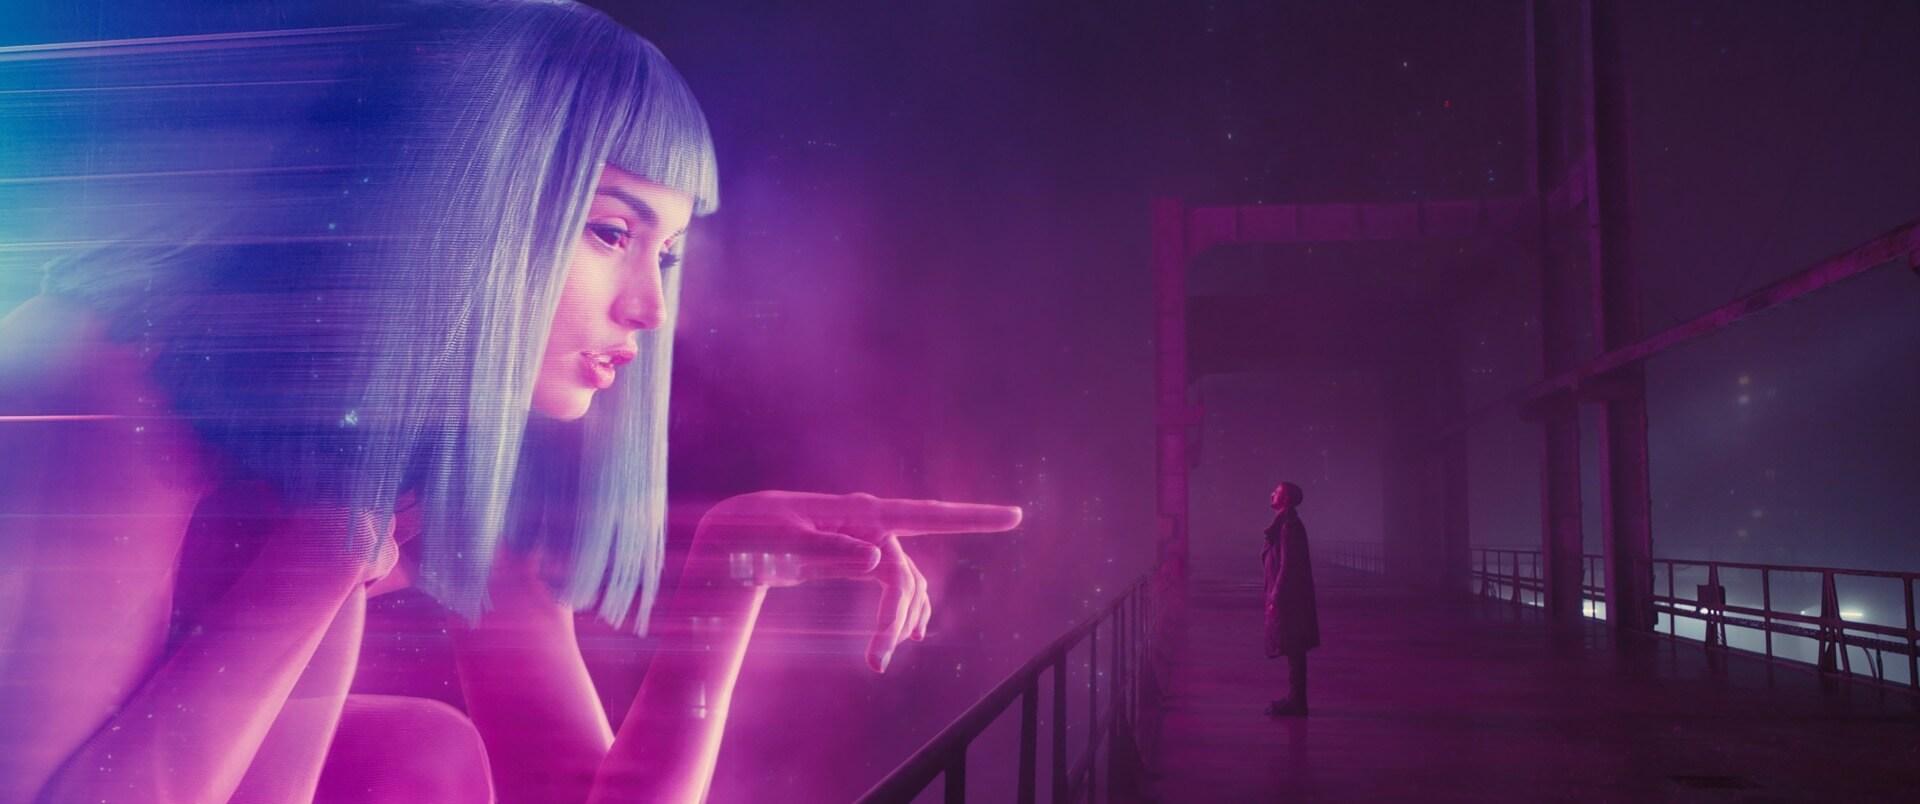 Ana de Armas Blade Runner 2049 (2017)